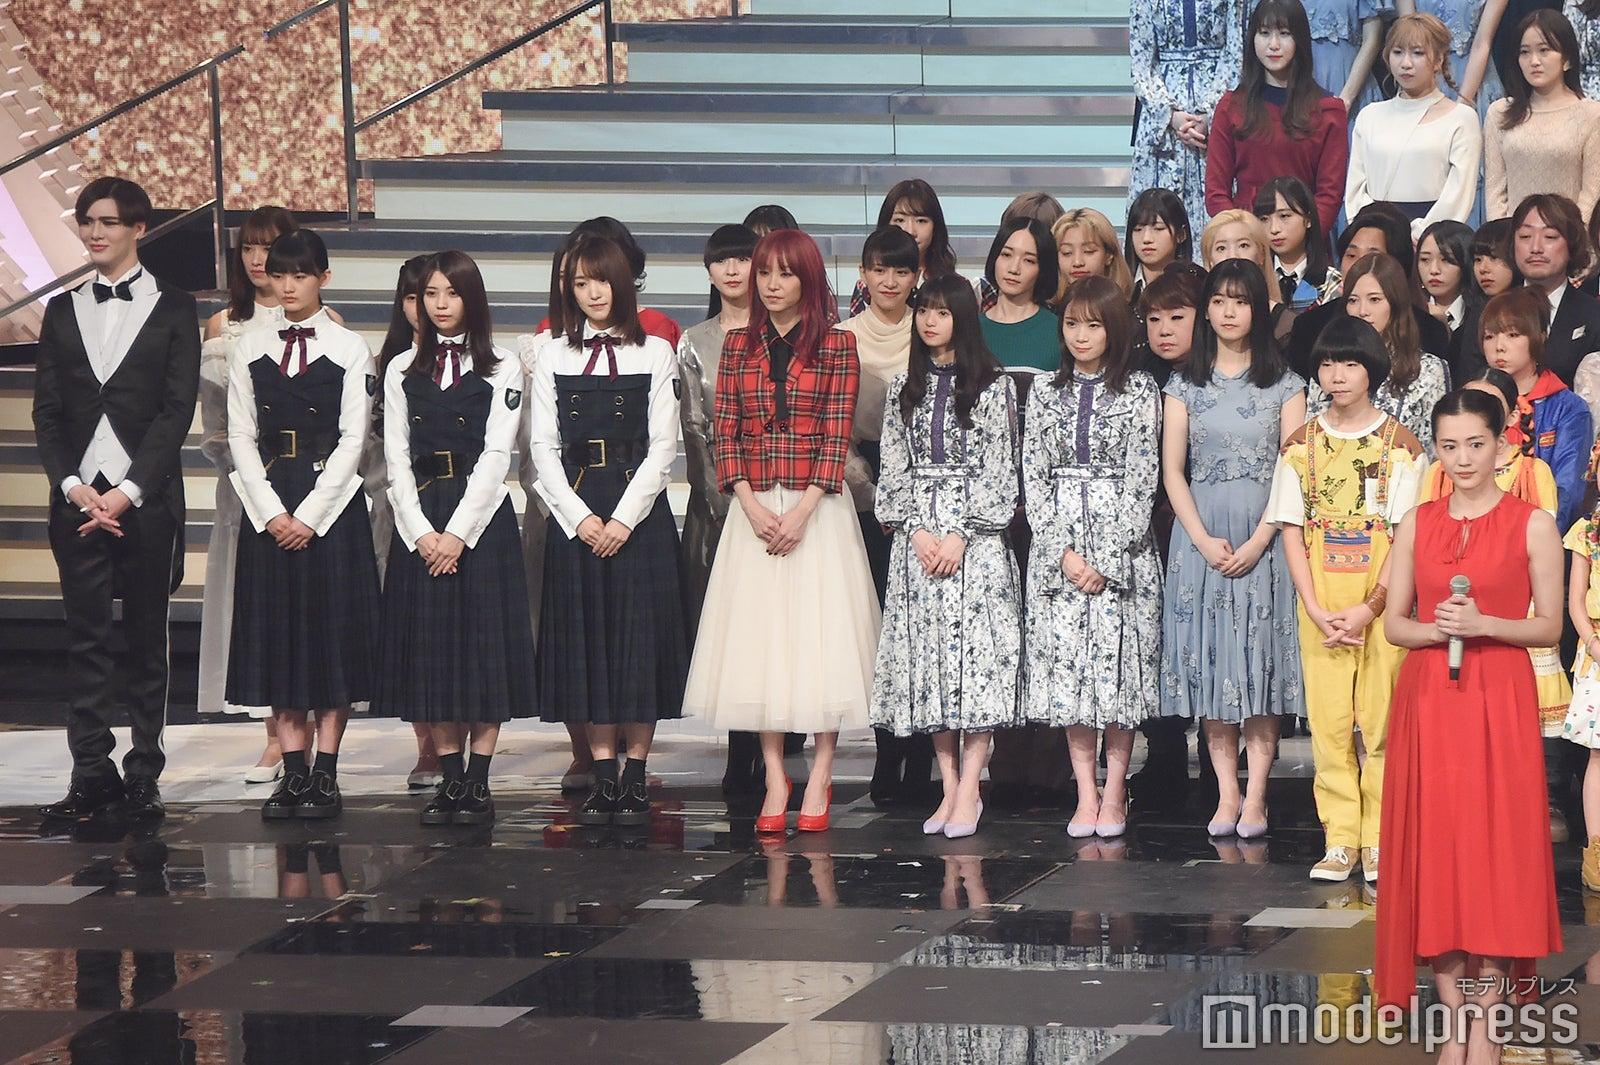 aikoの世界一かわいいマンコ伝説2020-2021 [無断転載禁止]©bbspink.com->画像>347枚